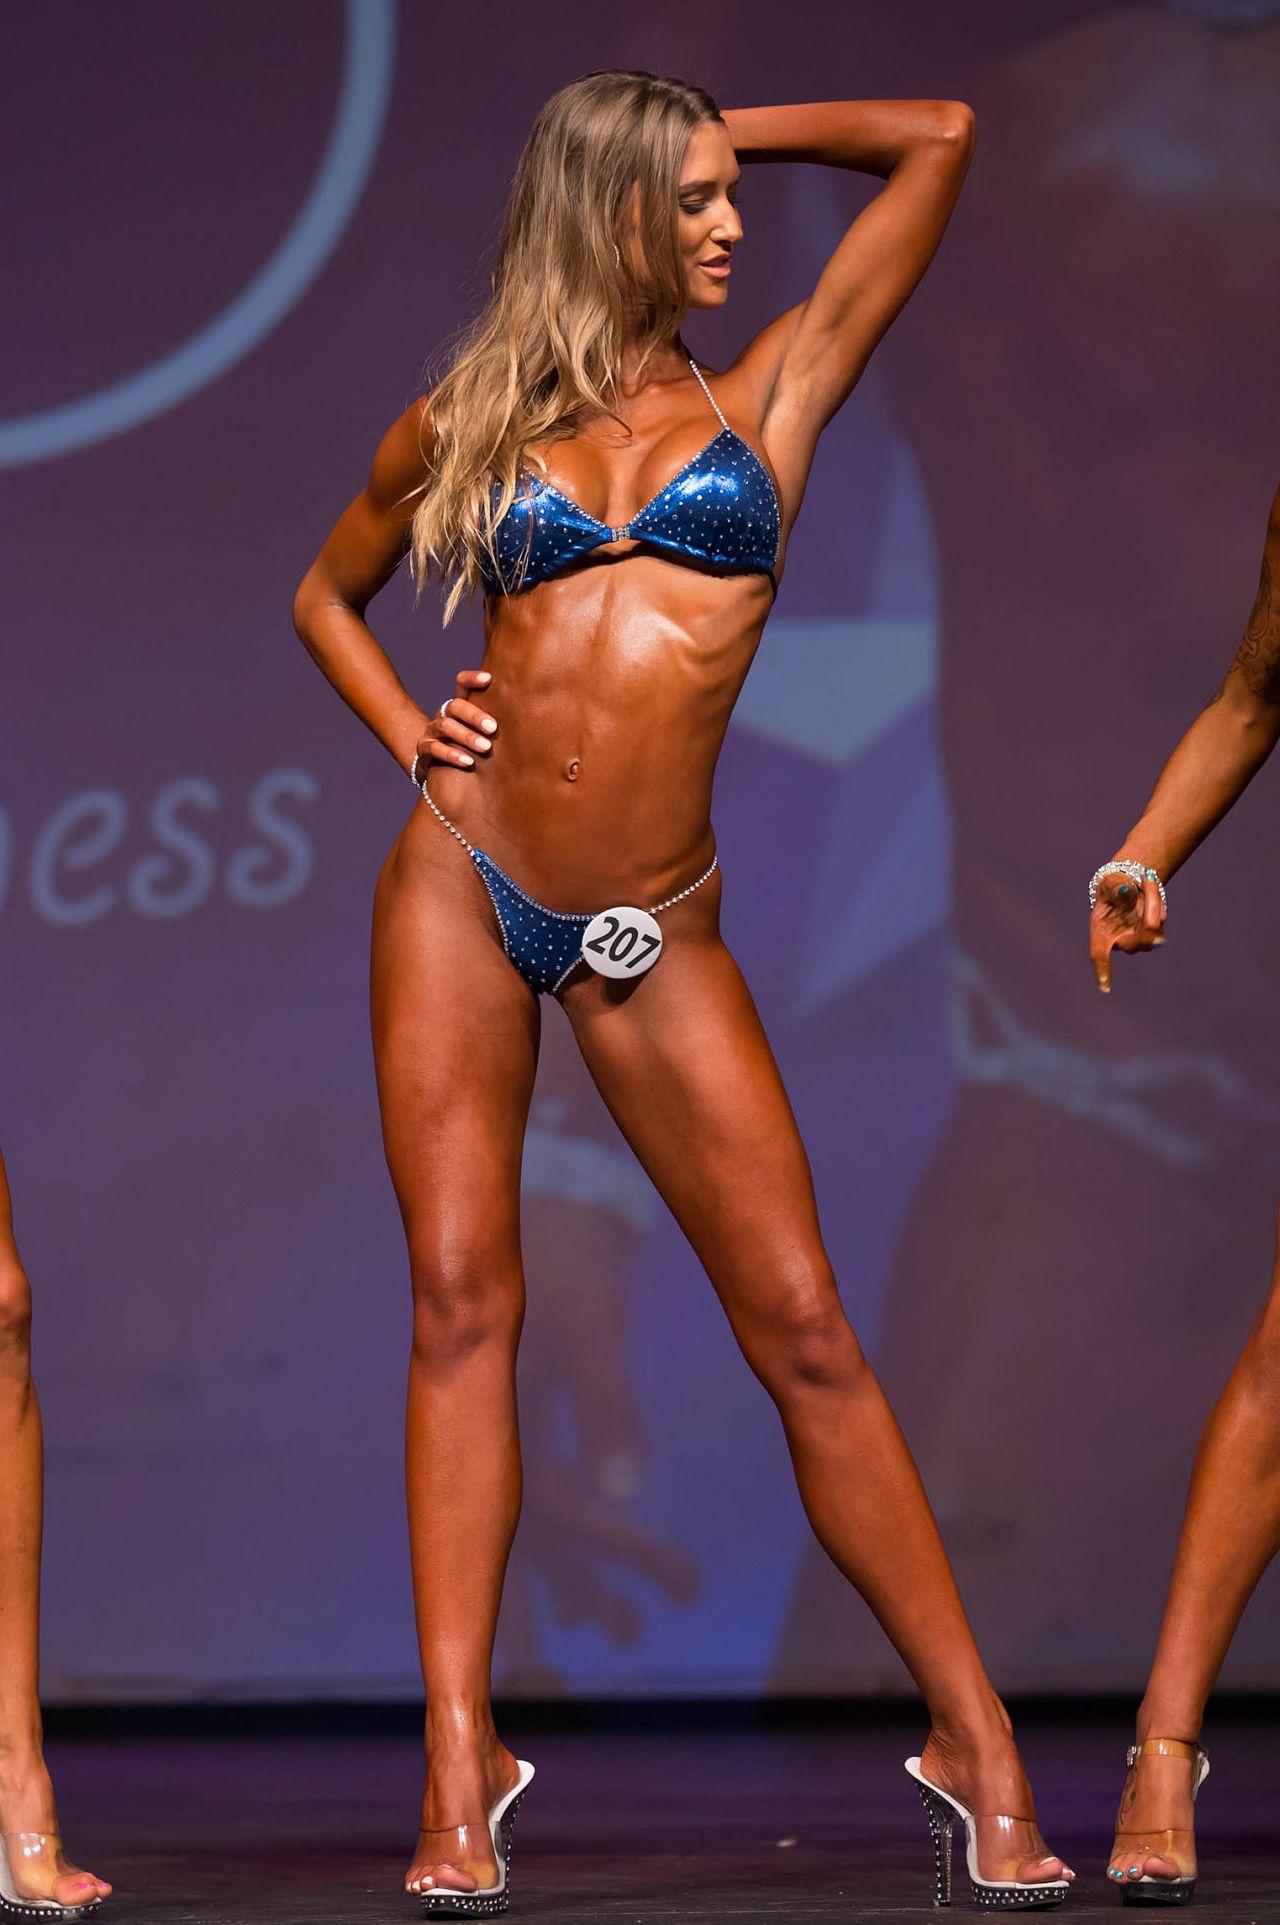 Danica Thrall 2014 Miami Pro Fitness Ms Bikini